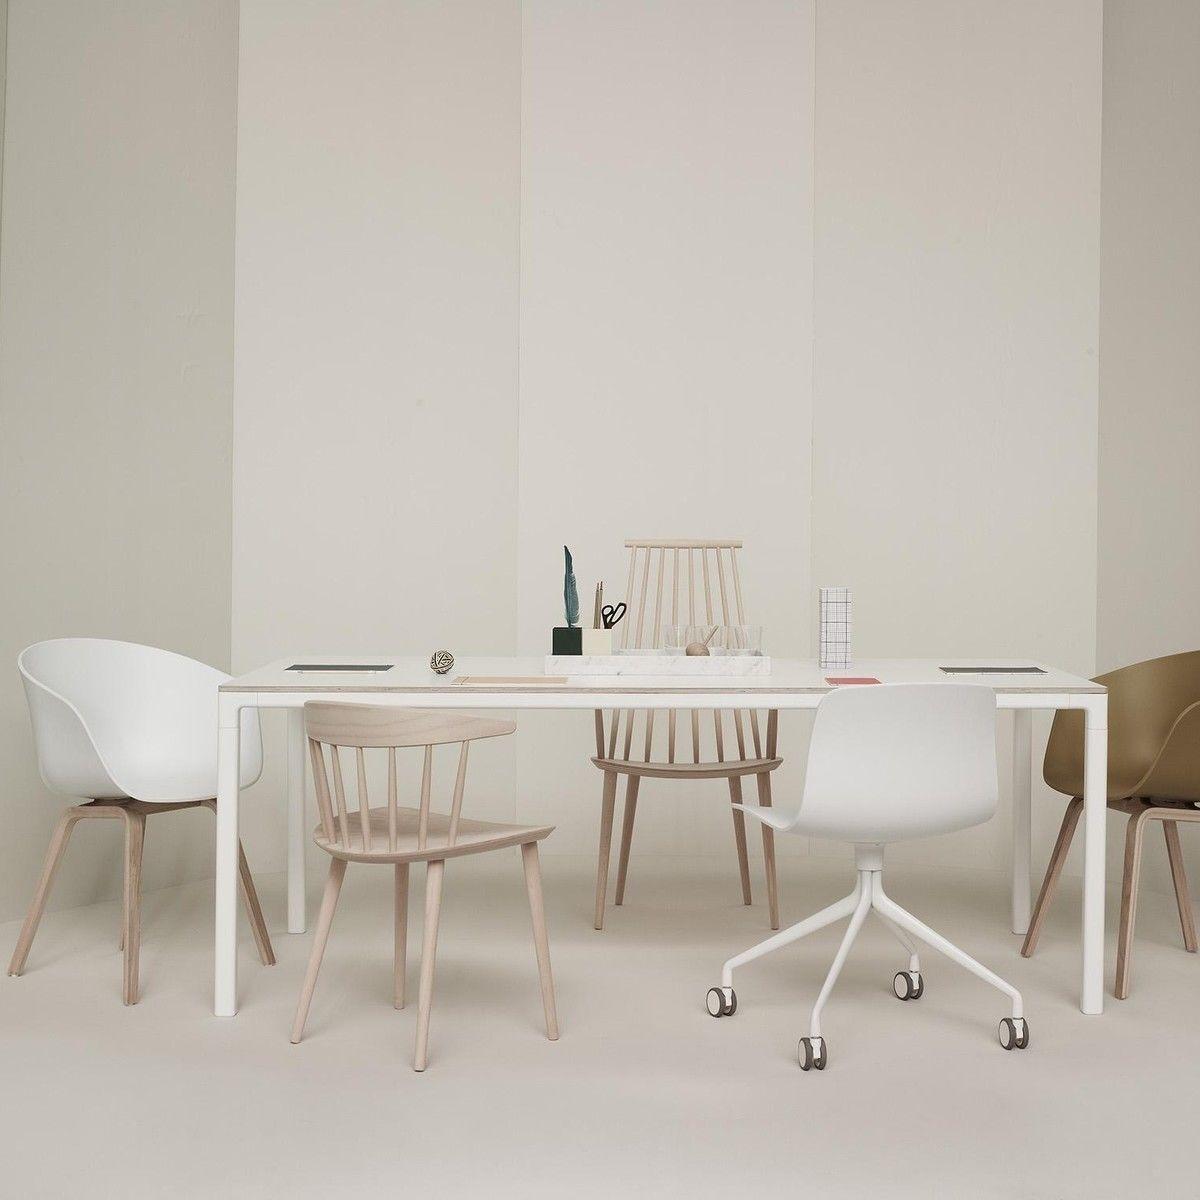 about a chair b rostuhl drehstuhl mit rollen hay. Black Bedroom Furniture Sets. Home Design Ideas